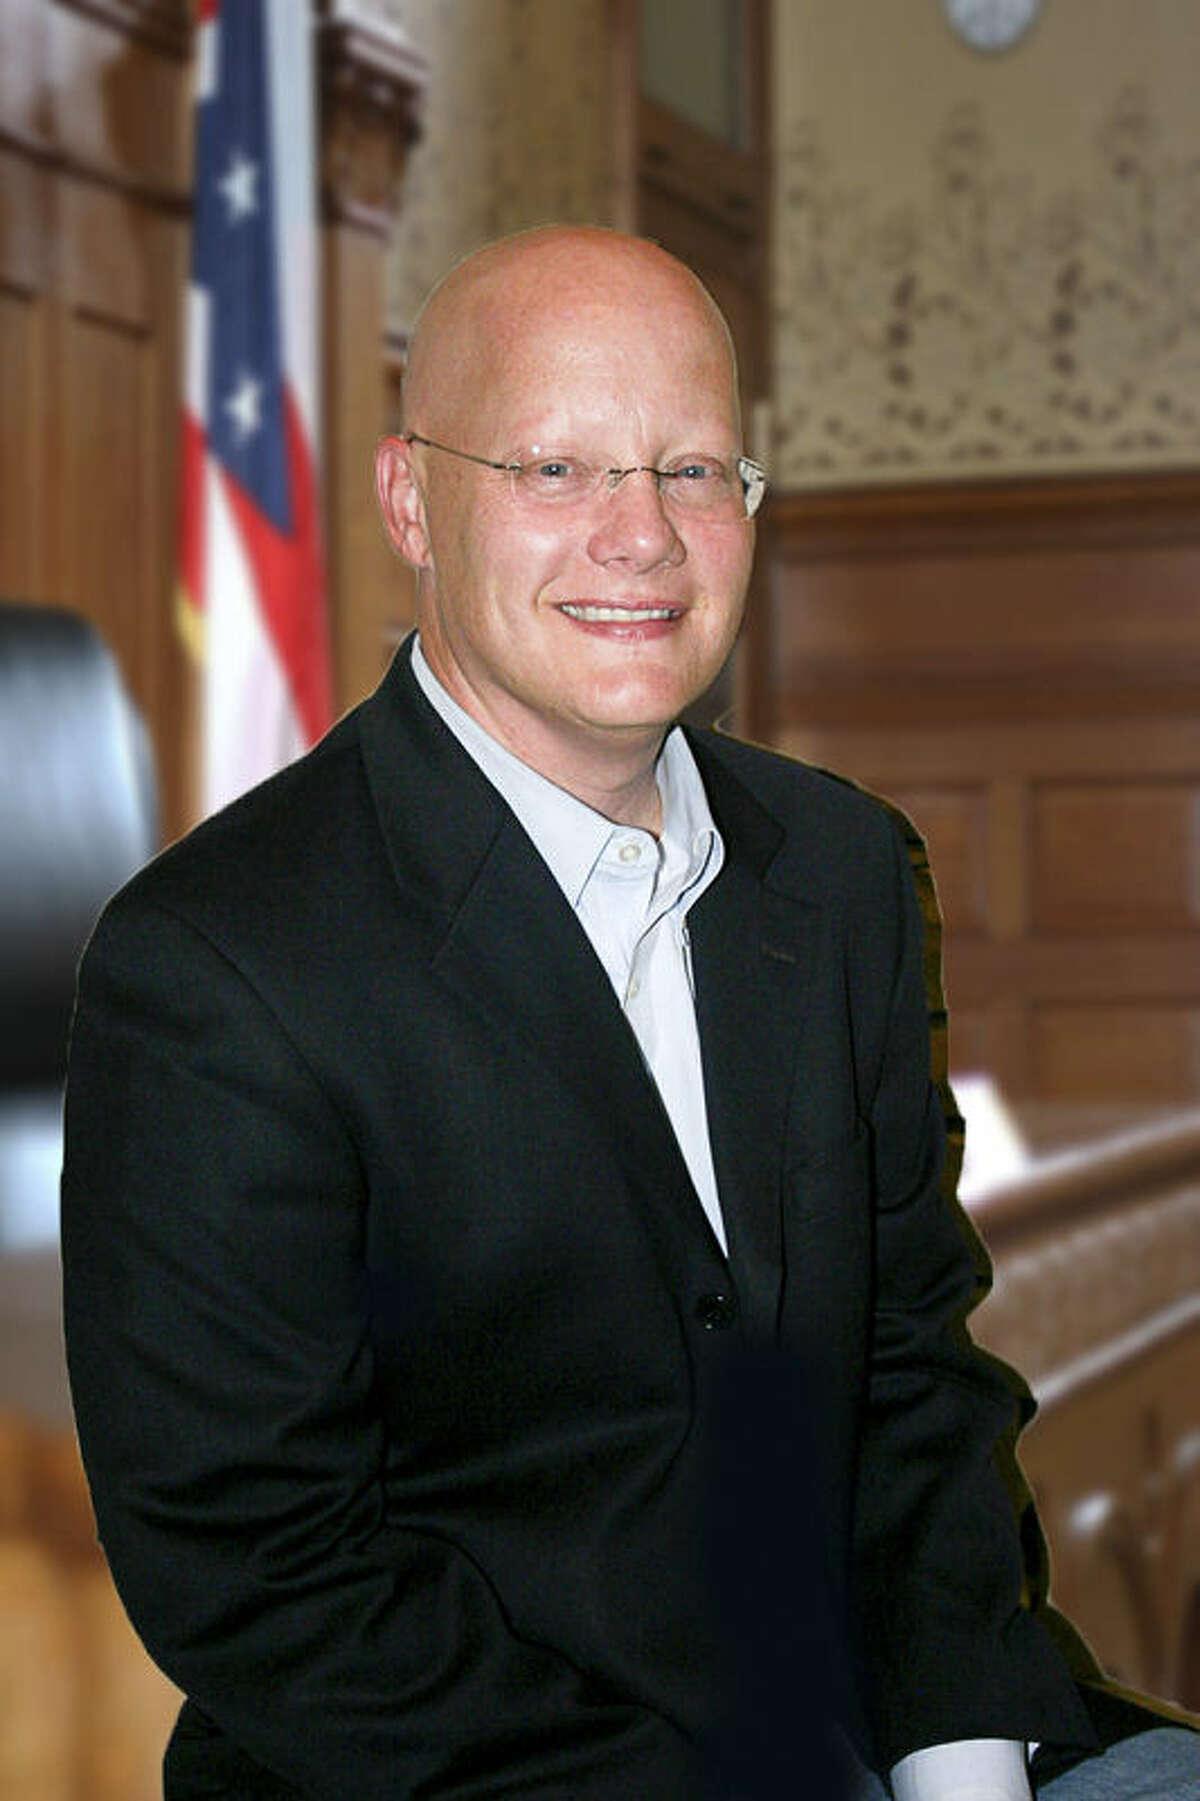 Judge Angus McGinty